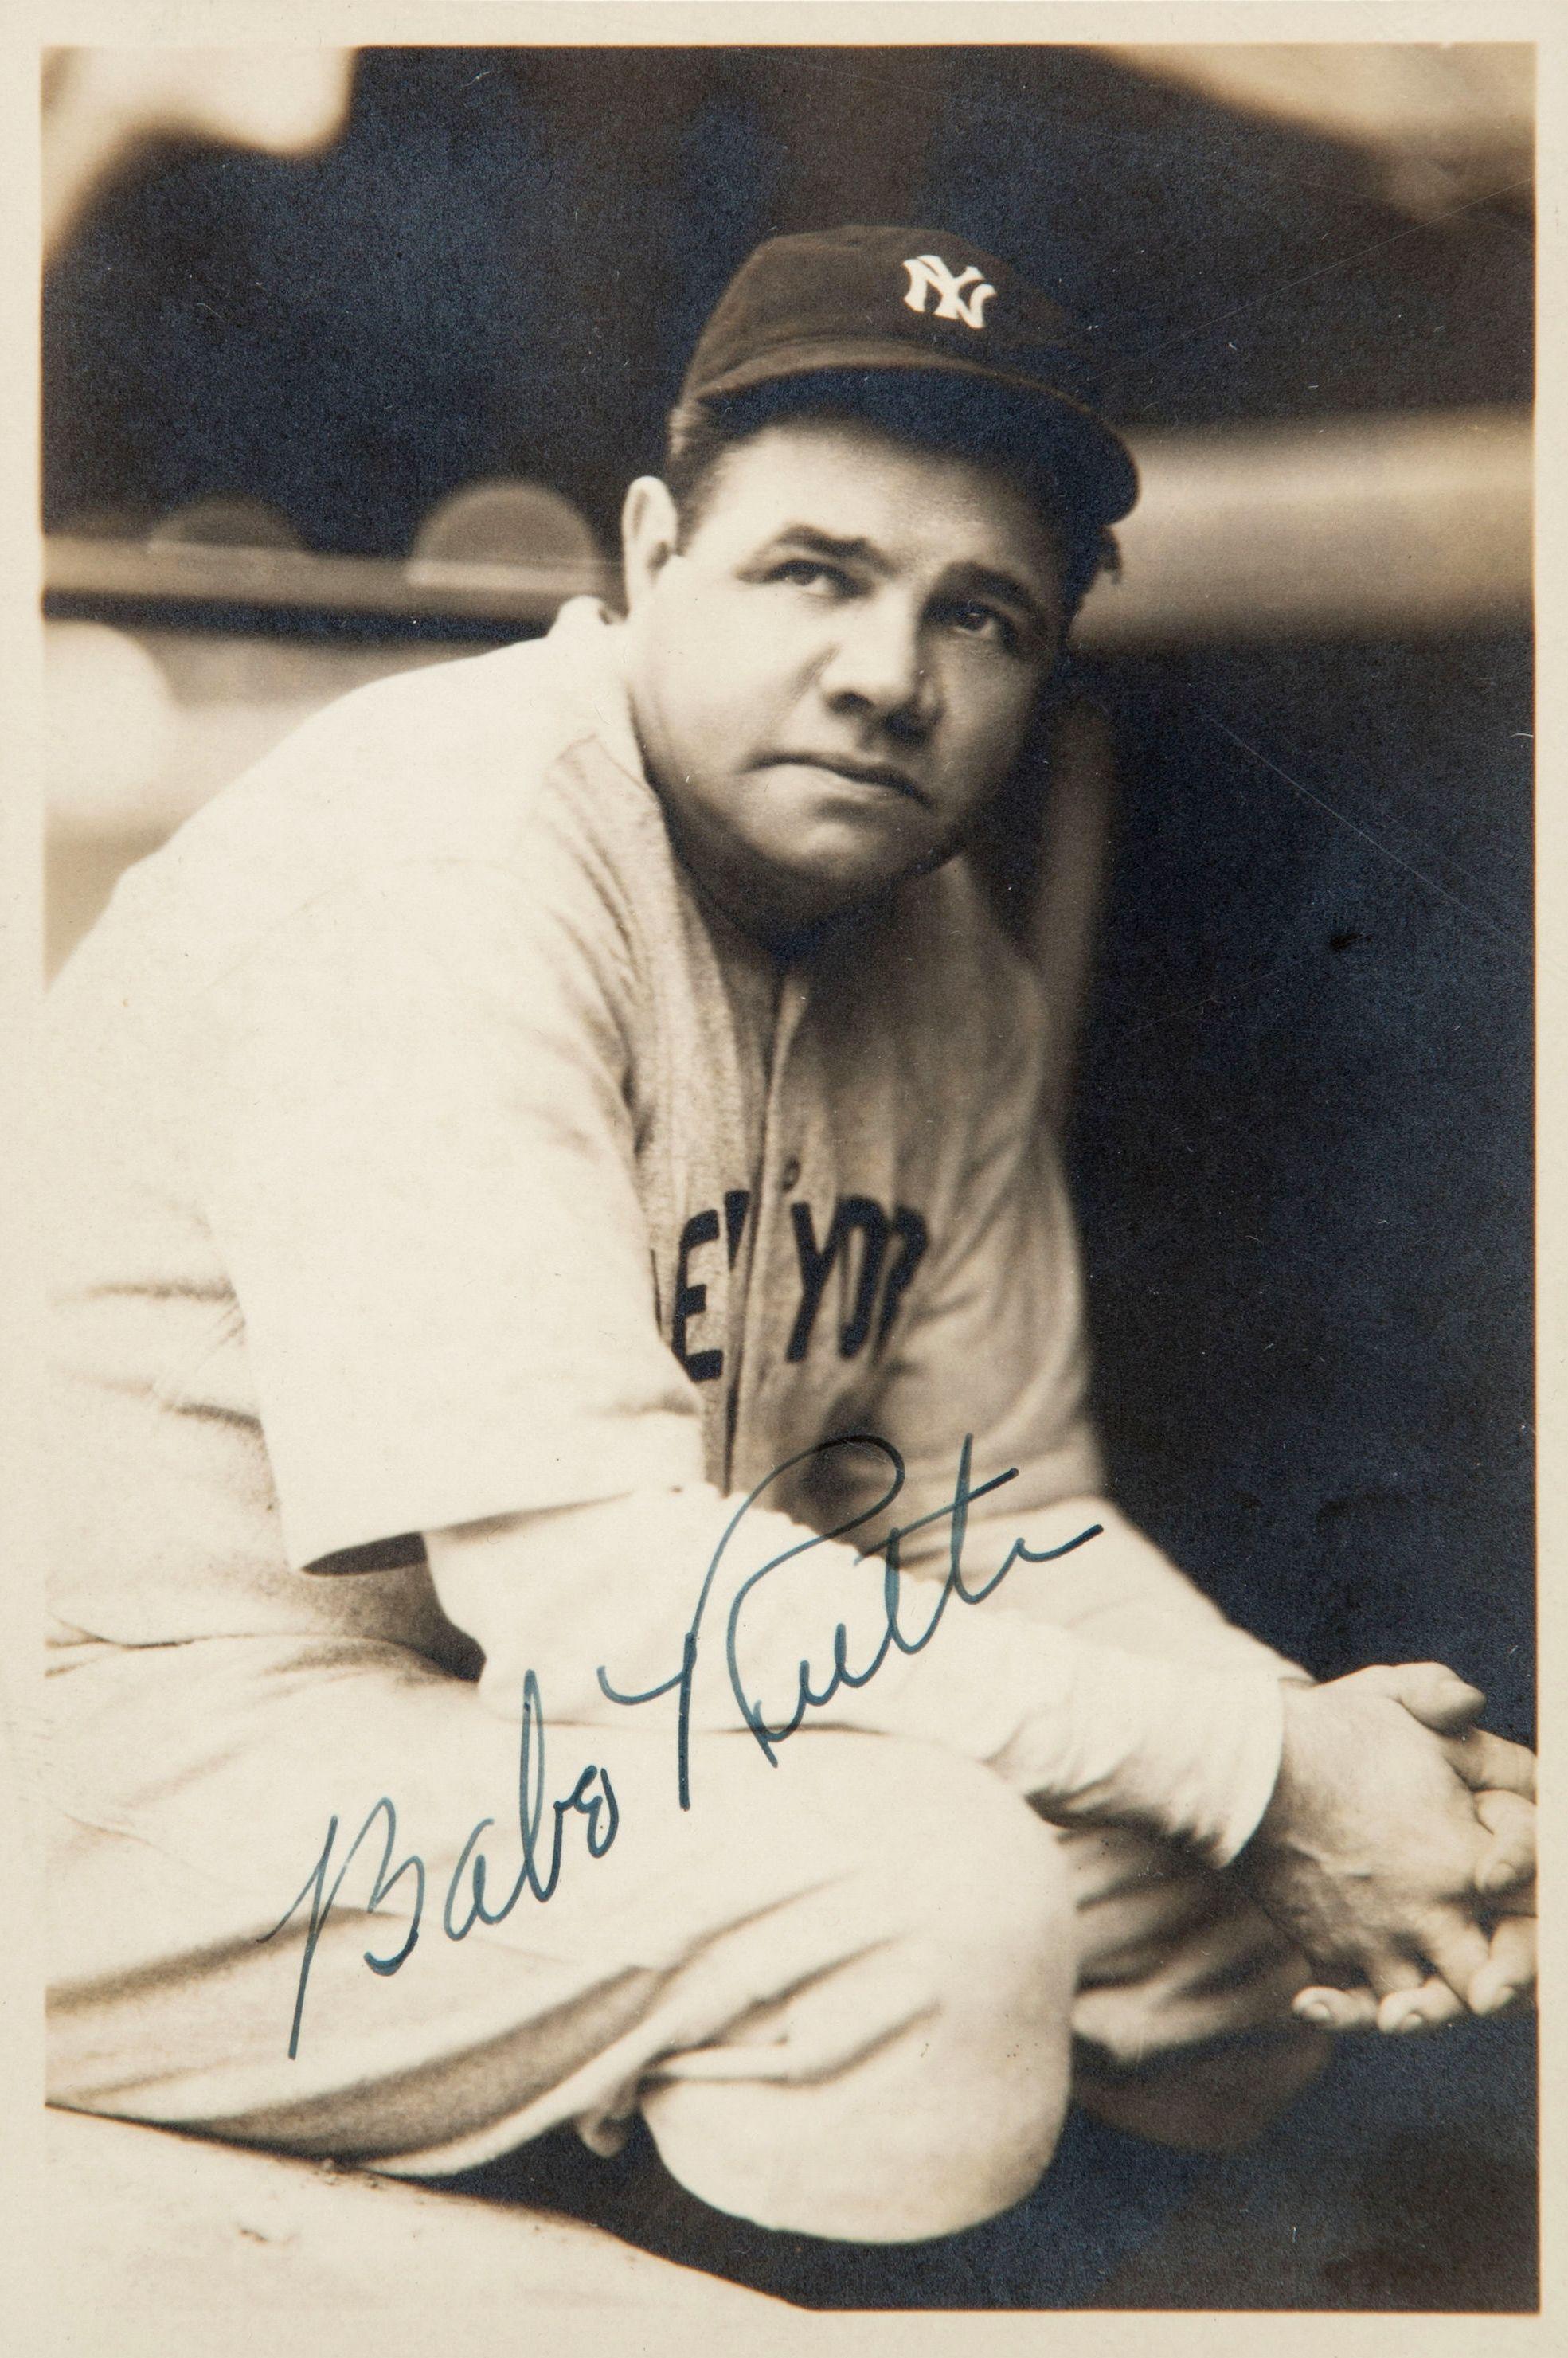 1930 S Babe Ruth Signed Photograph By George Burke Baseball Classic Babe Ruth Baseball Memorabilia